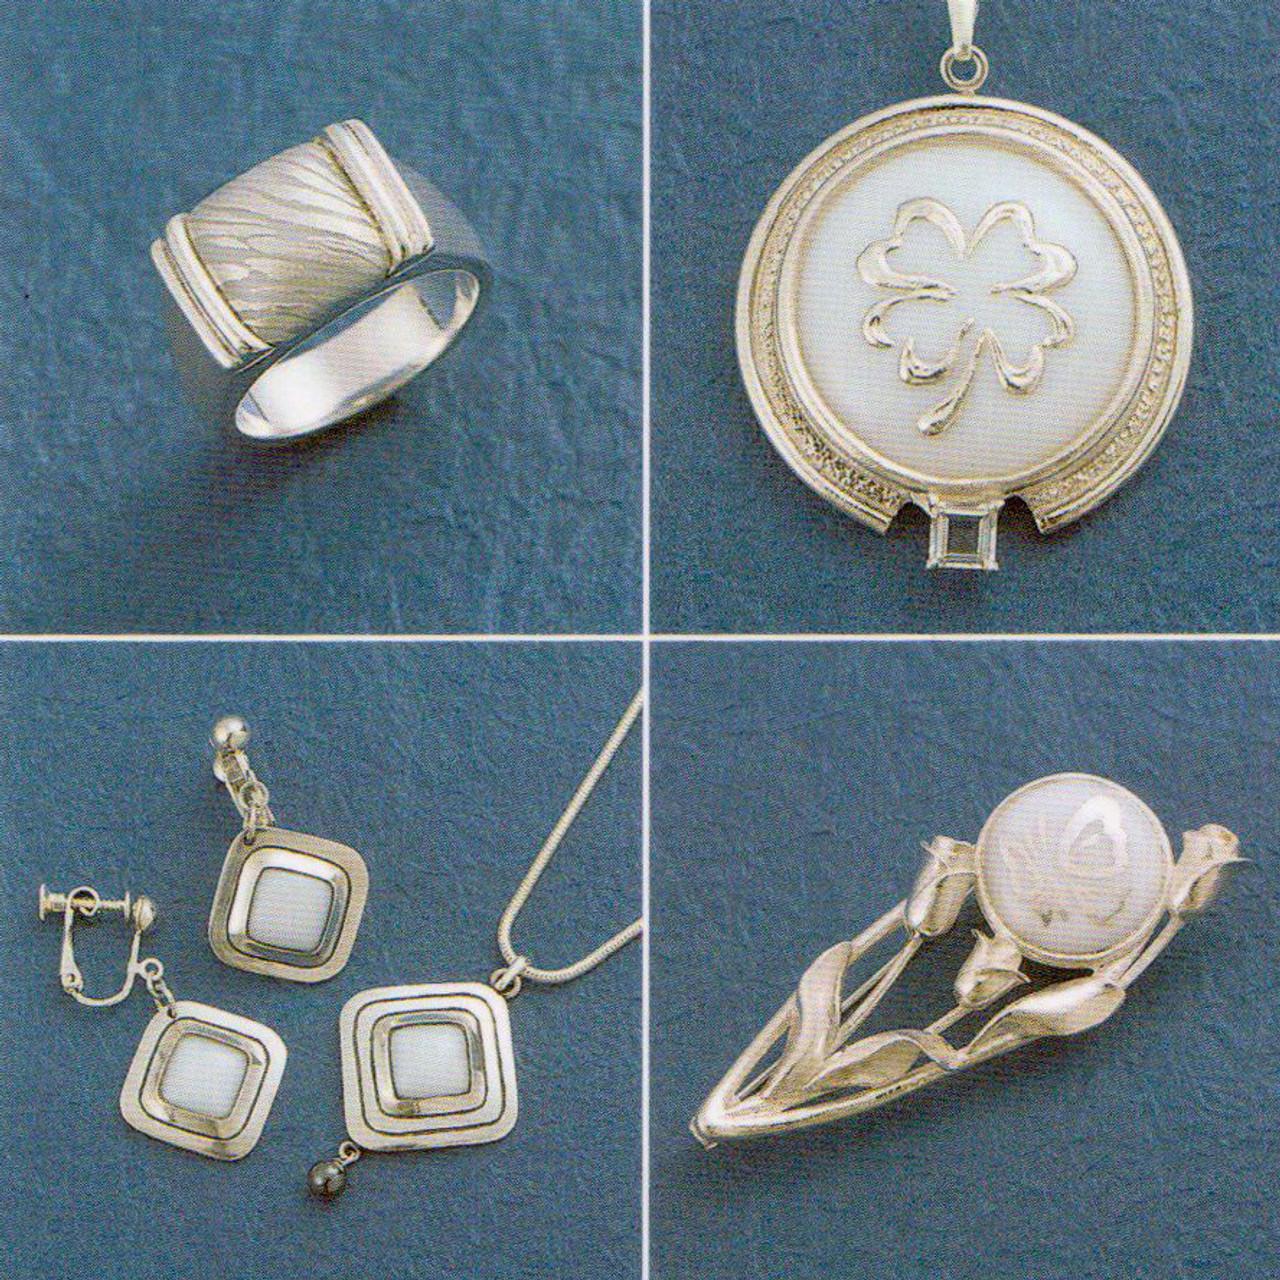 Art Clay Silver Overlay Paste - add real genuine fine silver to glazed ceramics!